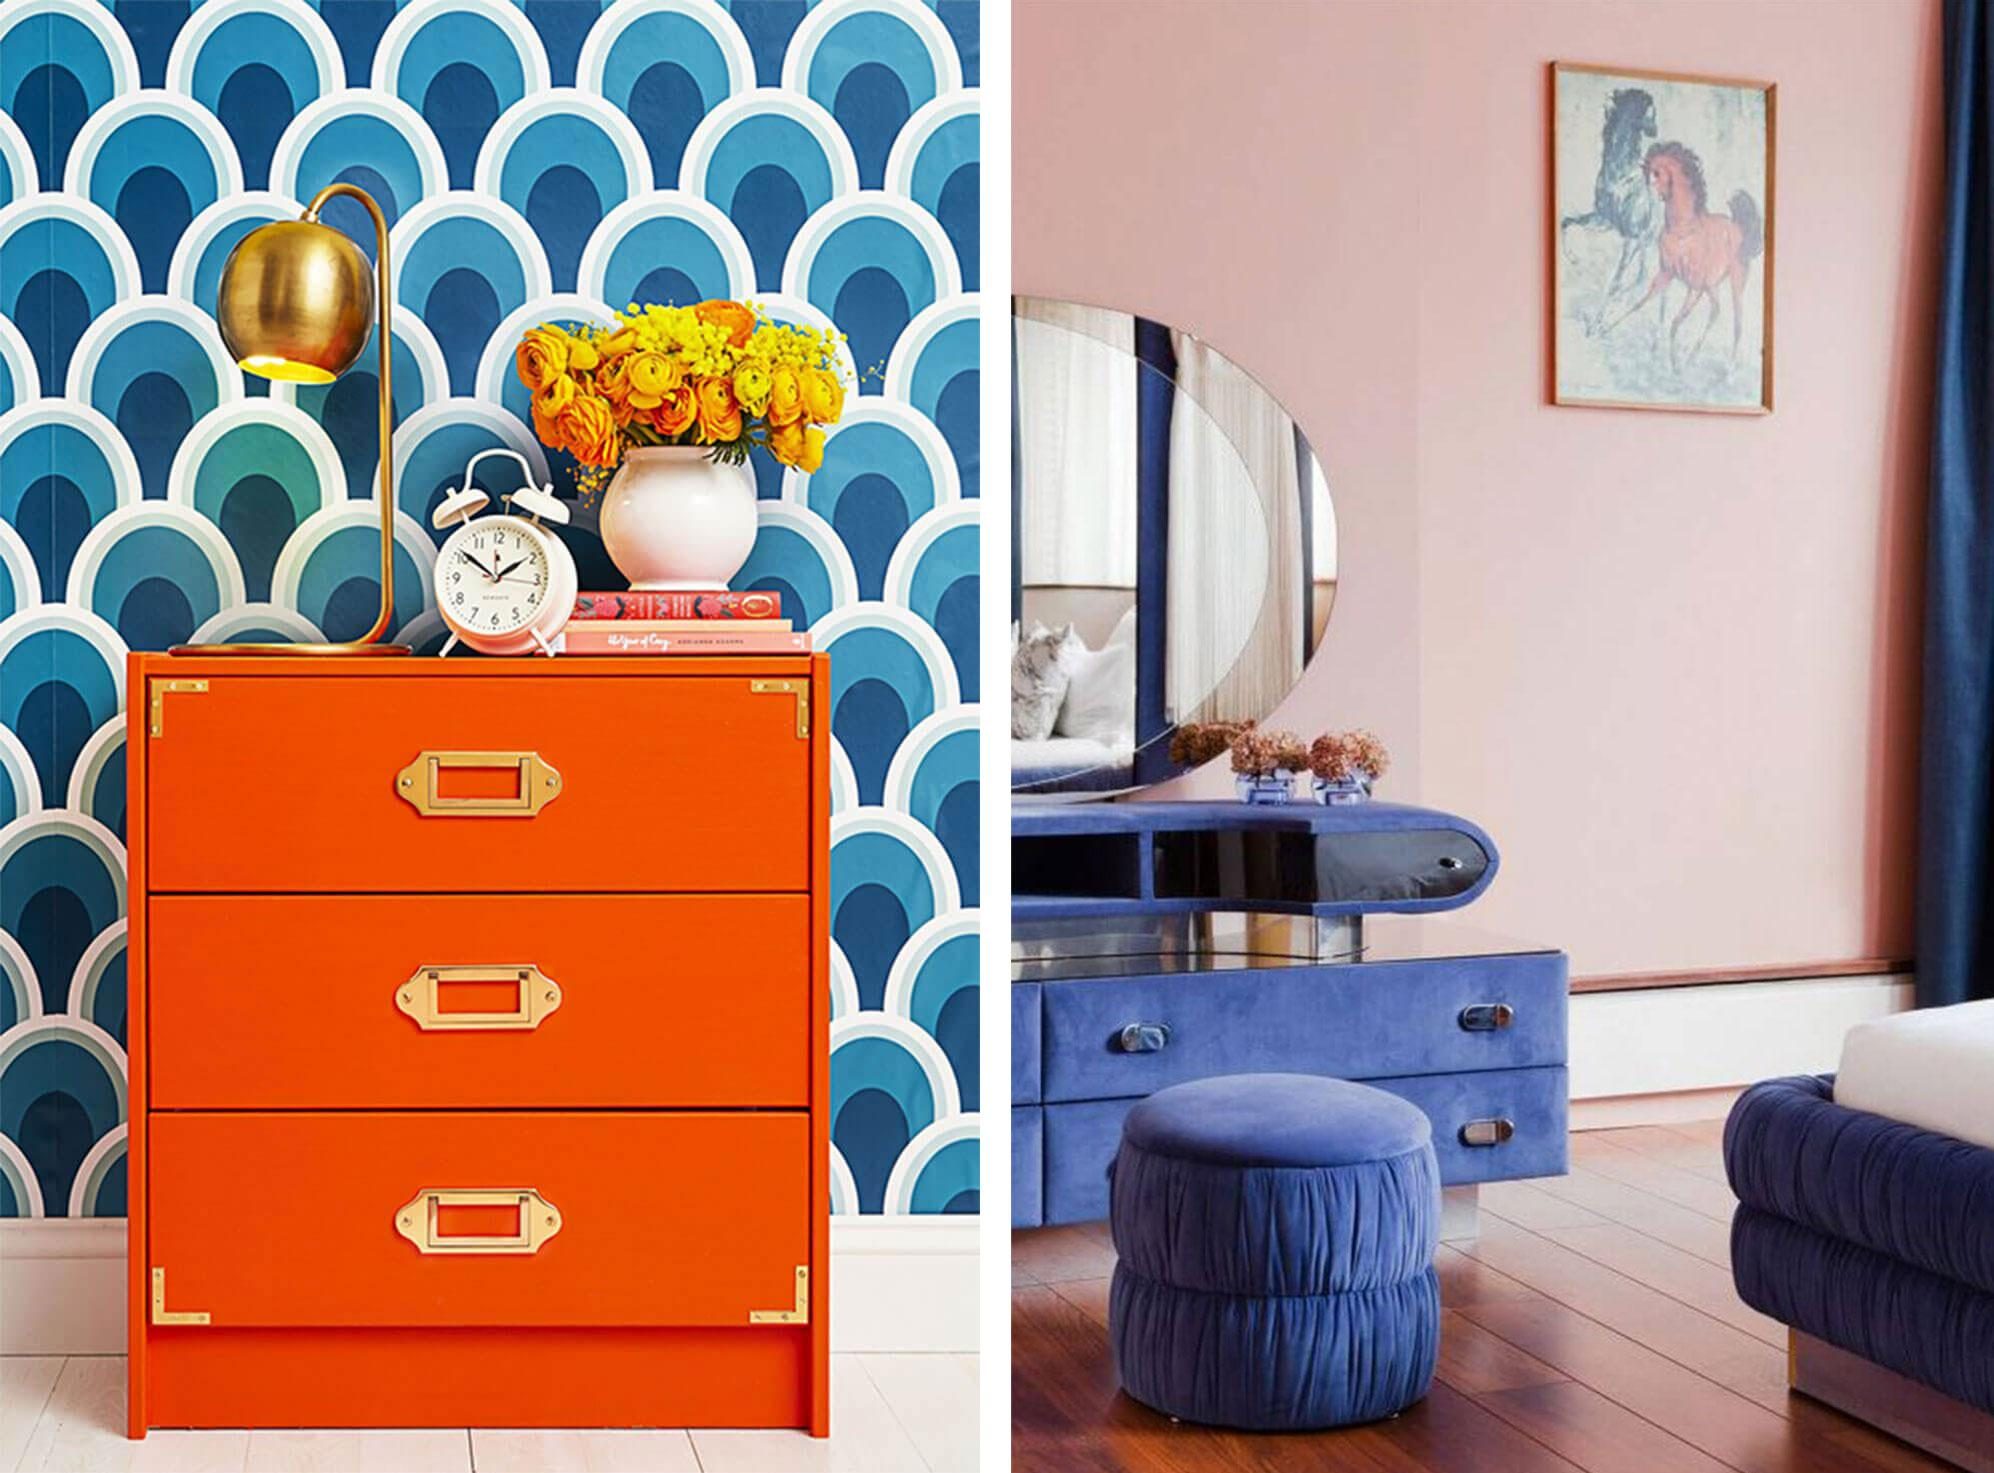 Vintage bright orange chest of drawers against blue patterned wallpaper